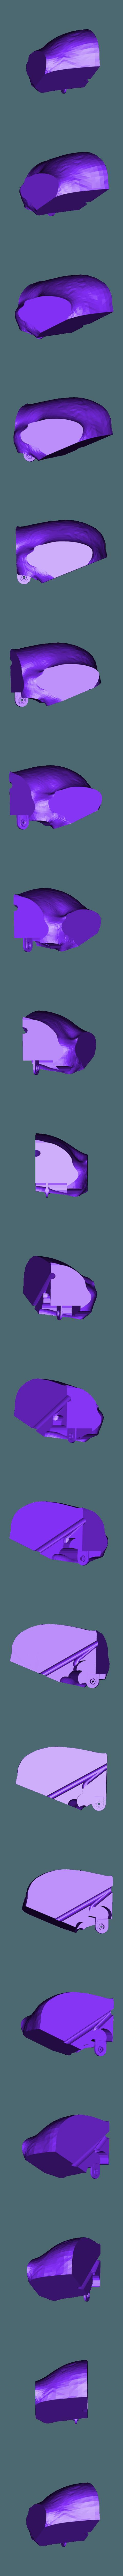 GADGETs head  pt4.stl Download free STL file GADGET the robotic Gremlin • 3D printing object, atarka3